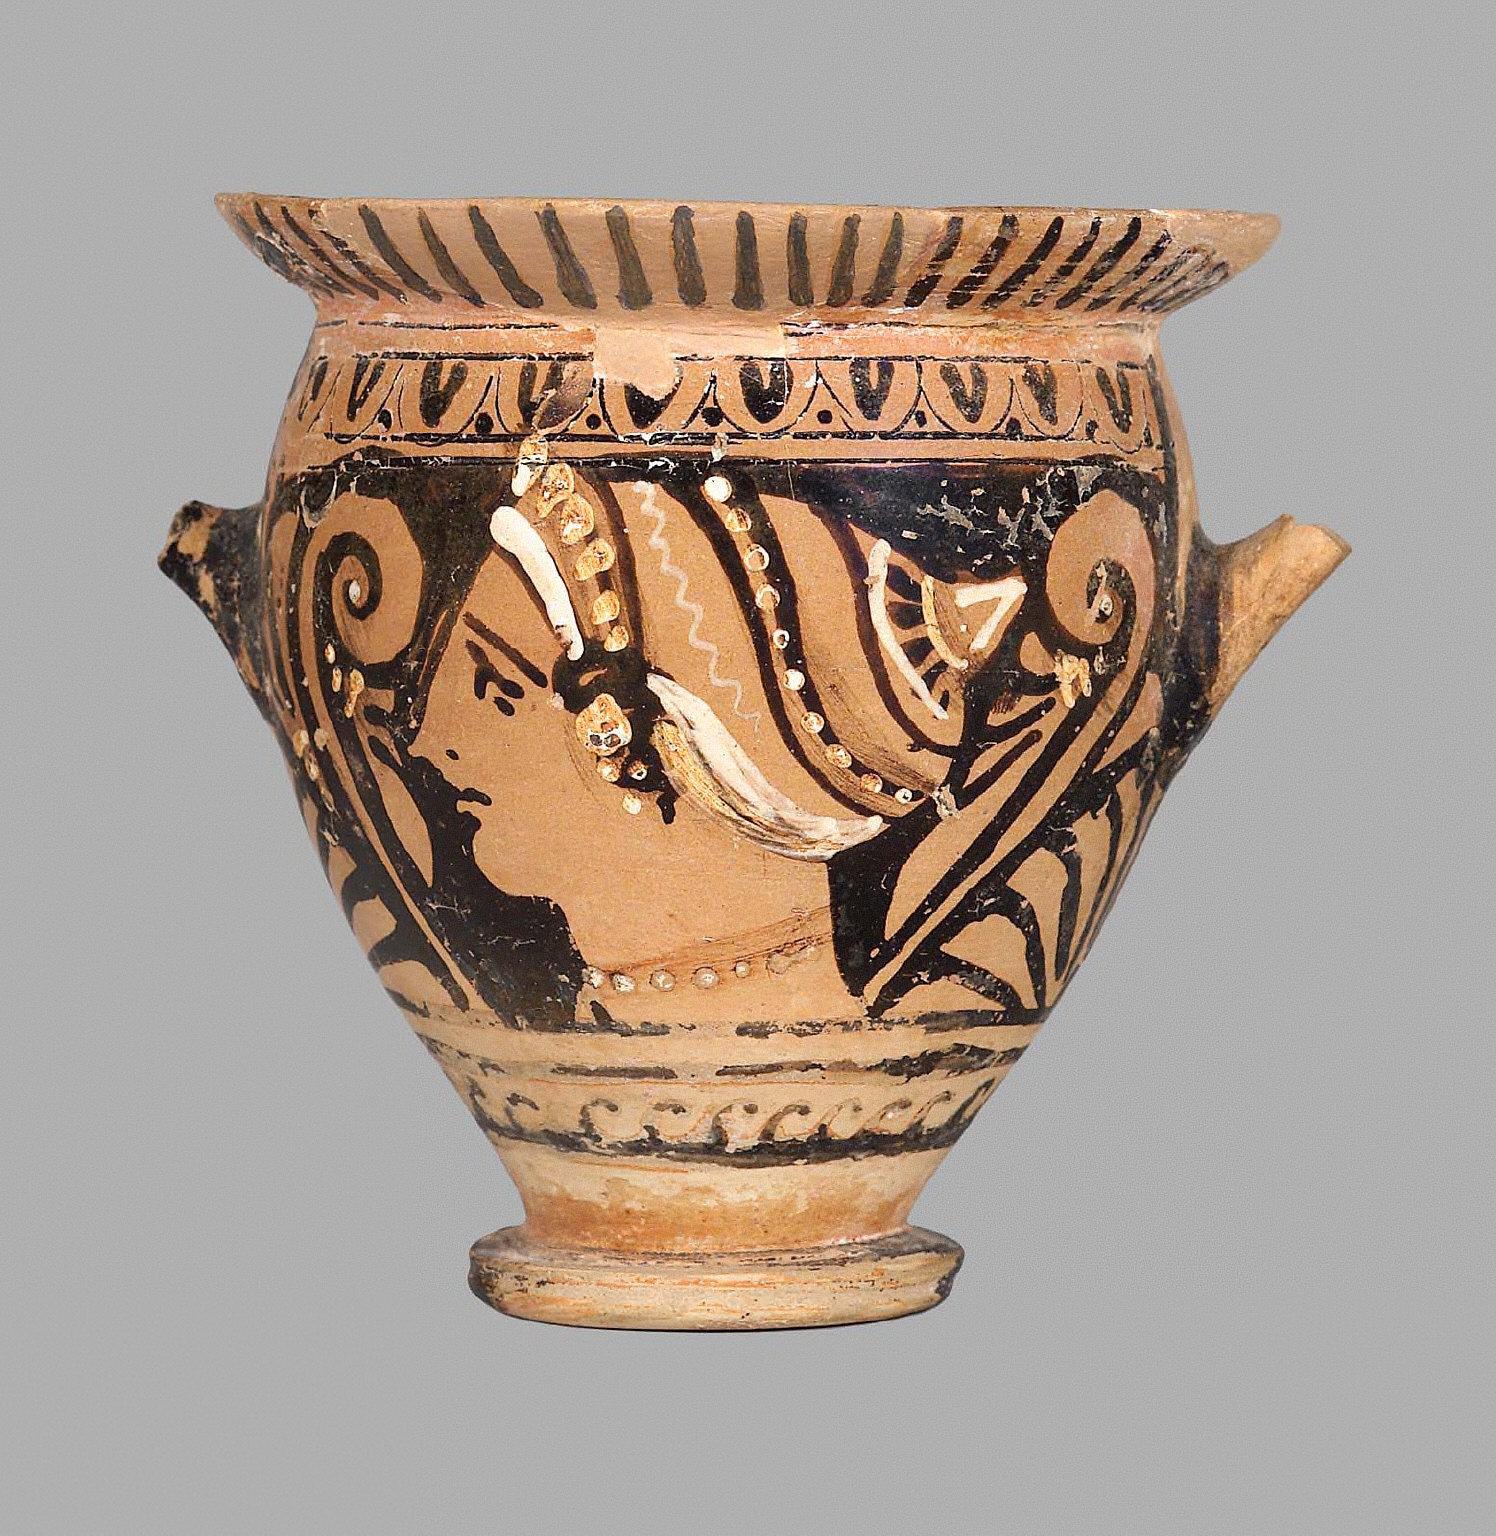 Skyphos (cup), Apulian